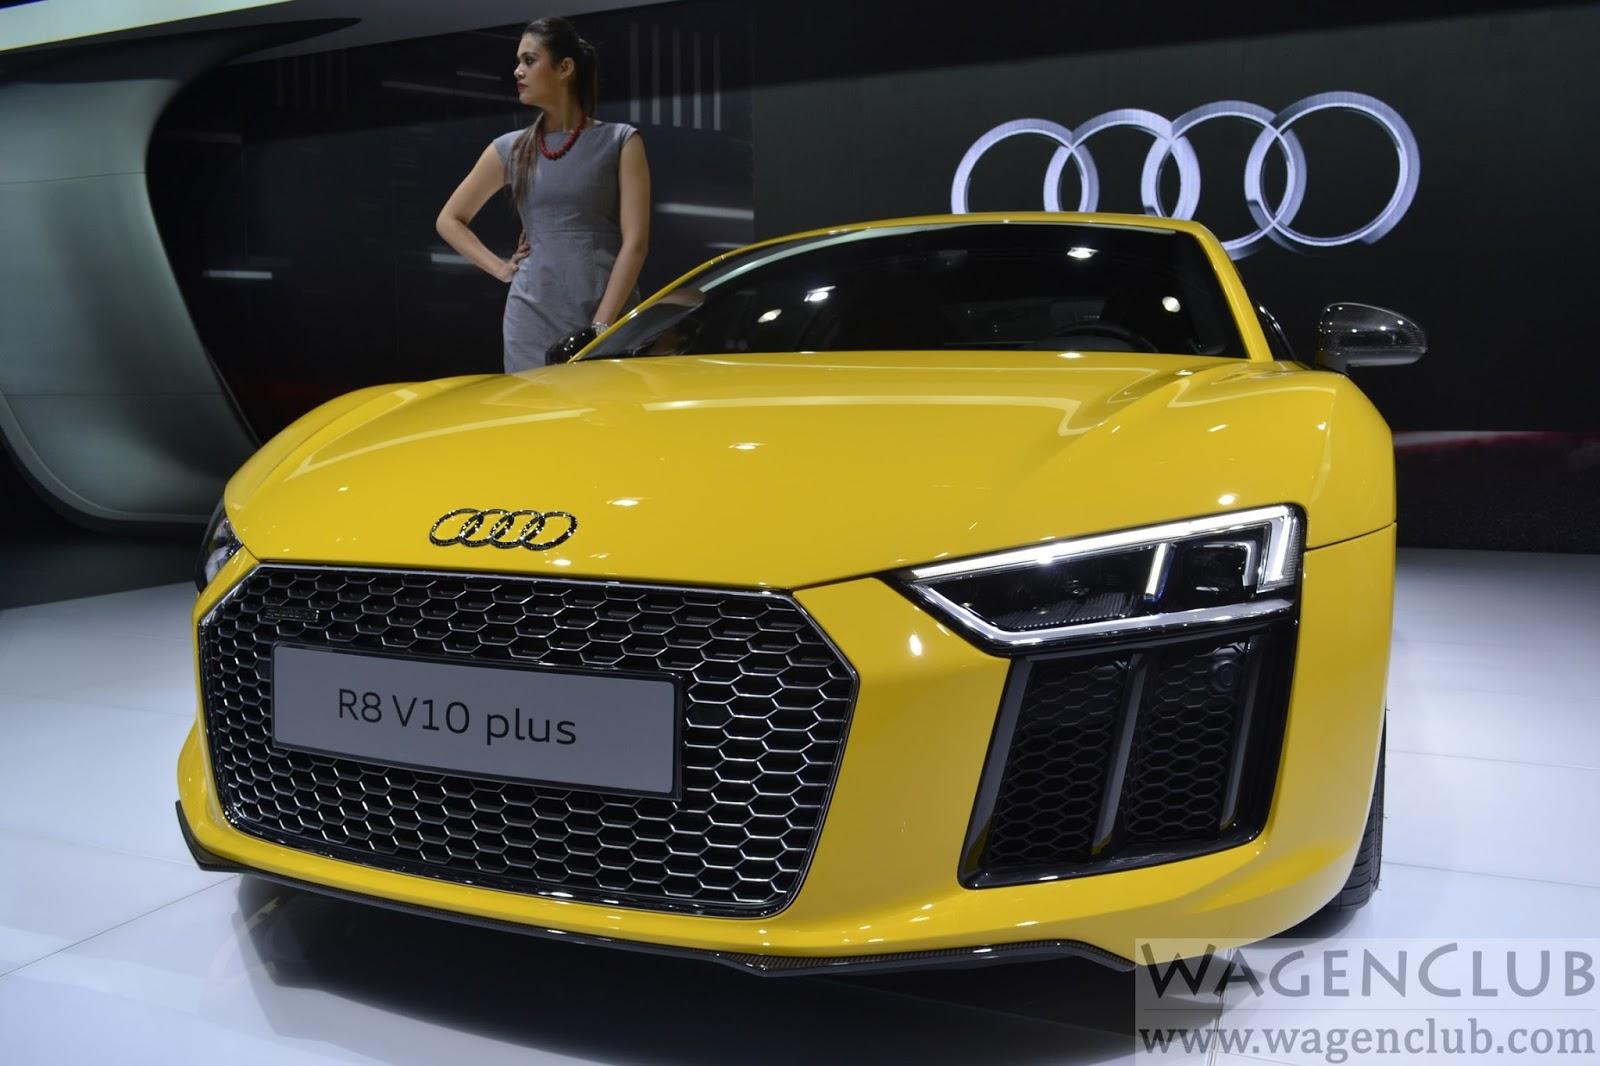 2016 Delhi Auto Expo Top 10 Concept Cars: 2016 Audi R8 V10 Plus Launched